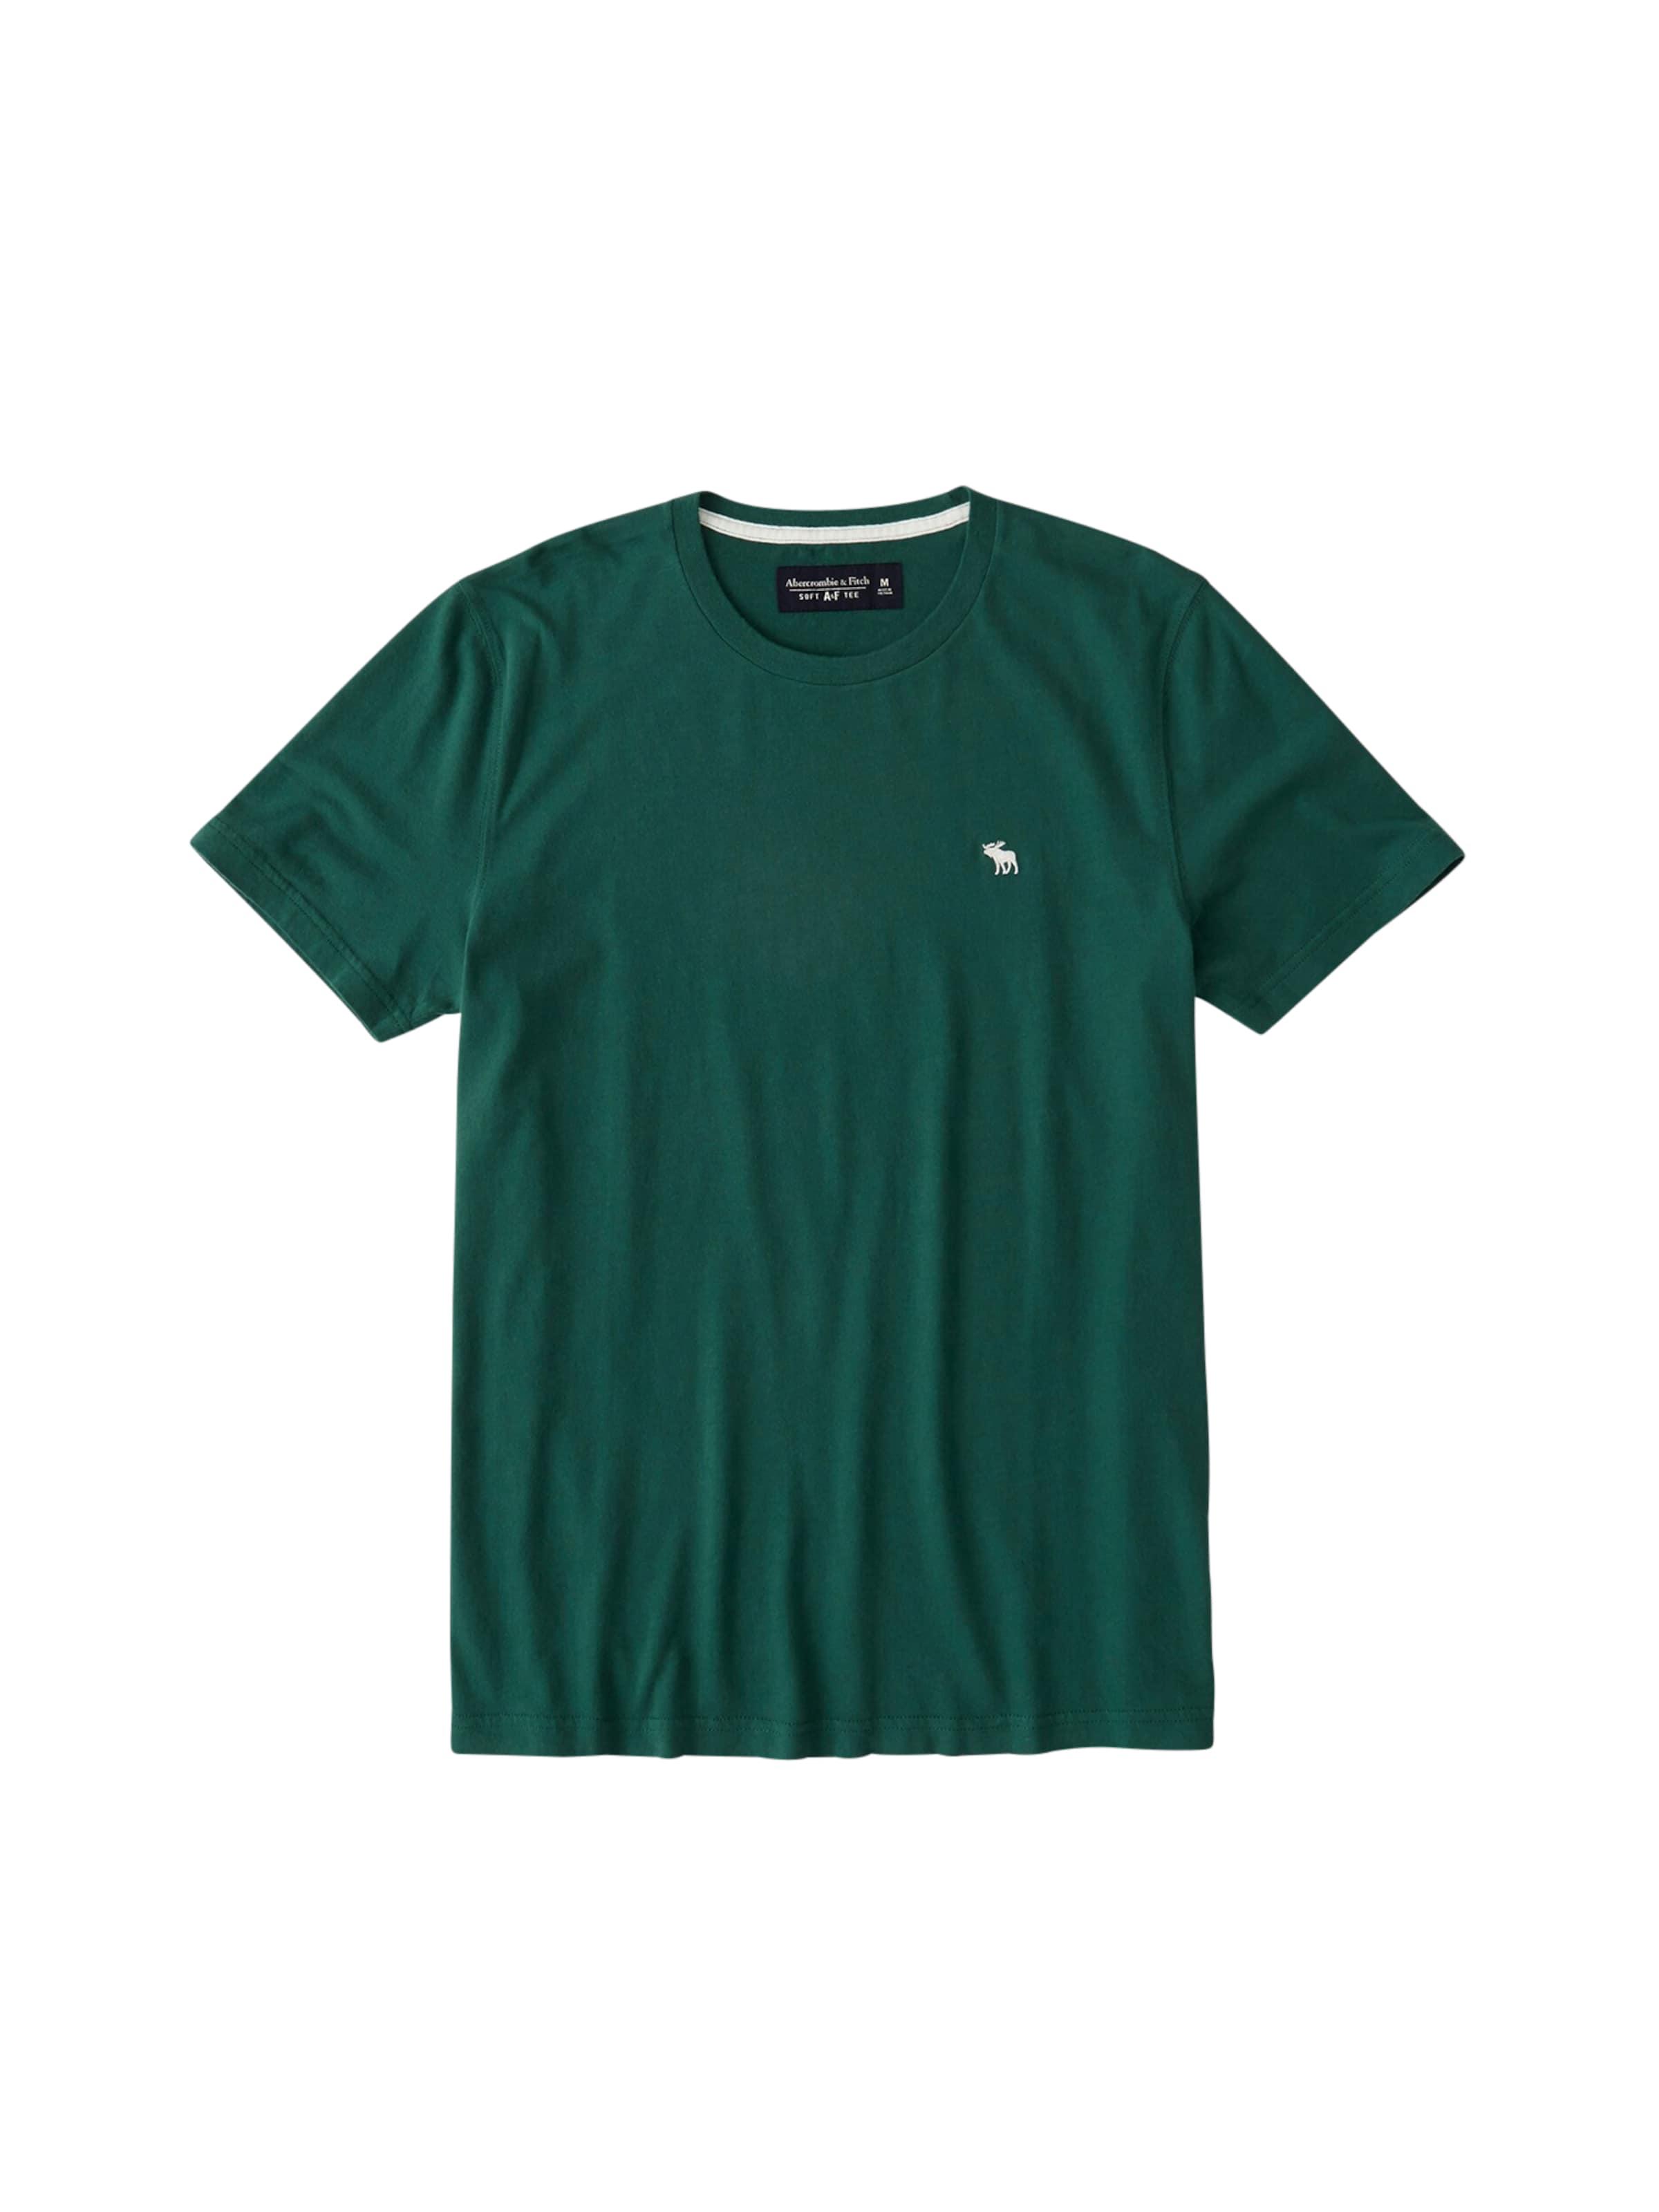 shirt Grün In T Abercrombieamp; Fitch tsdhQr